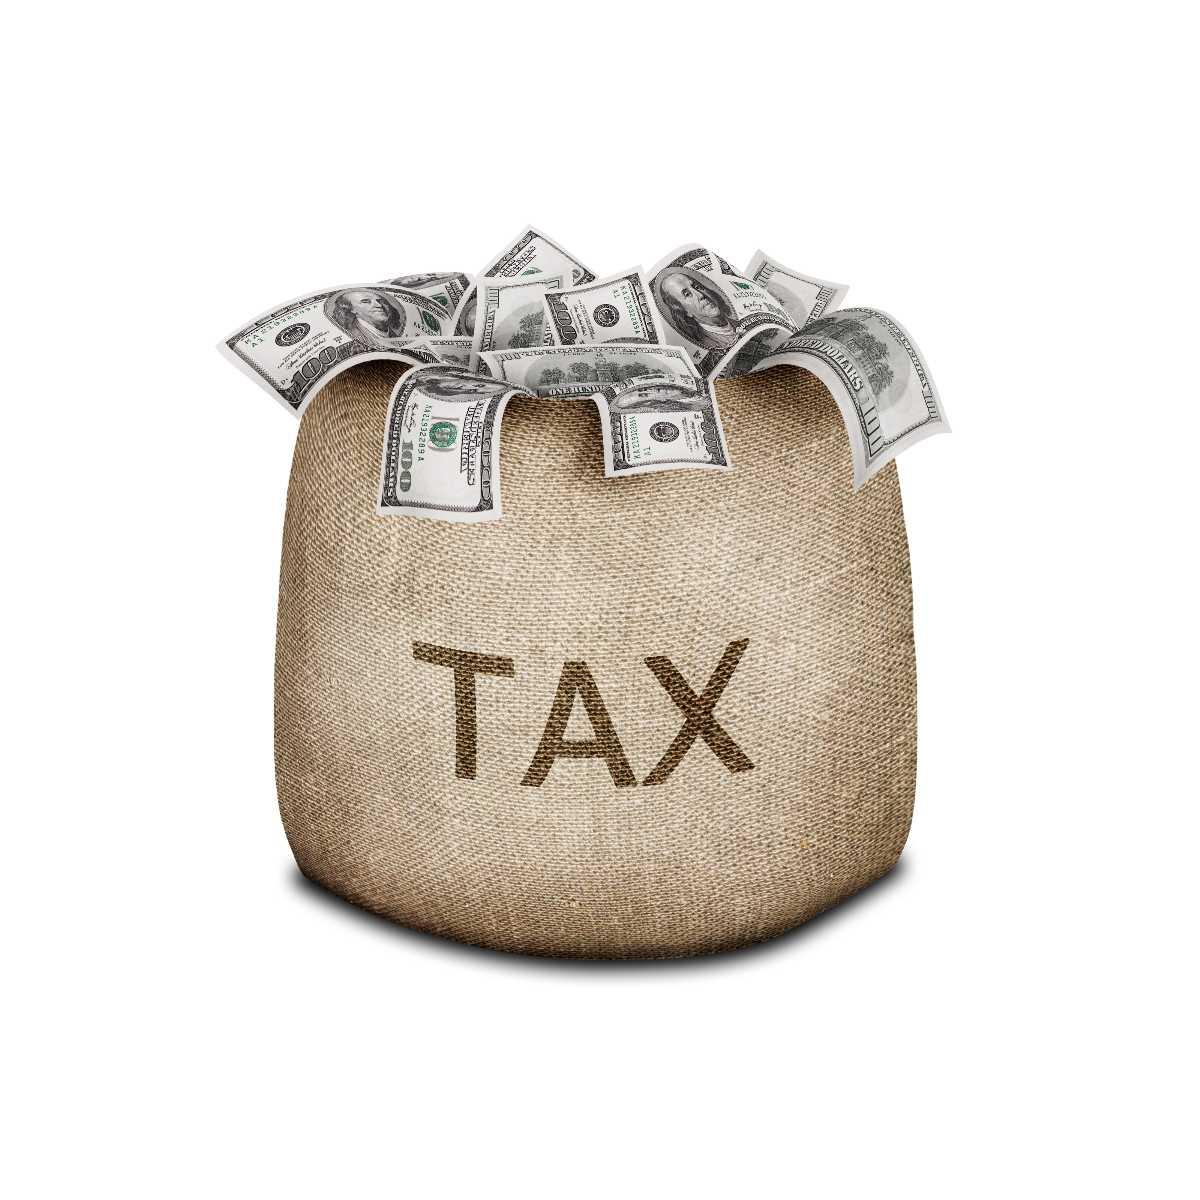 Tax Bag